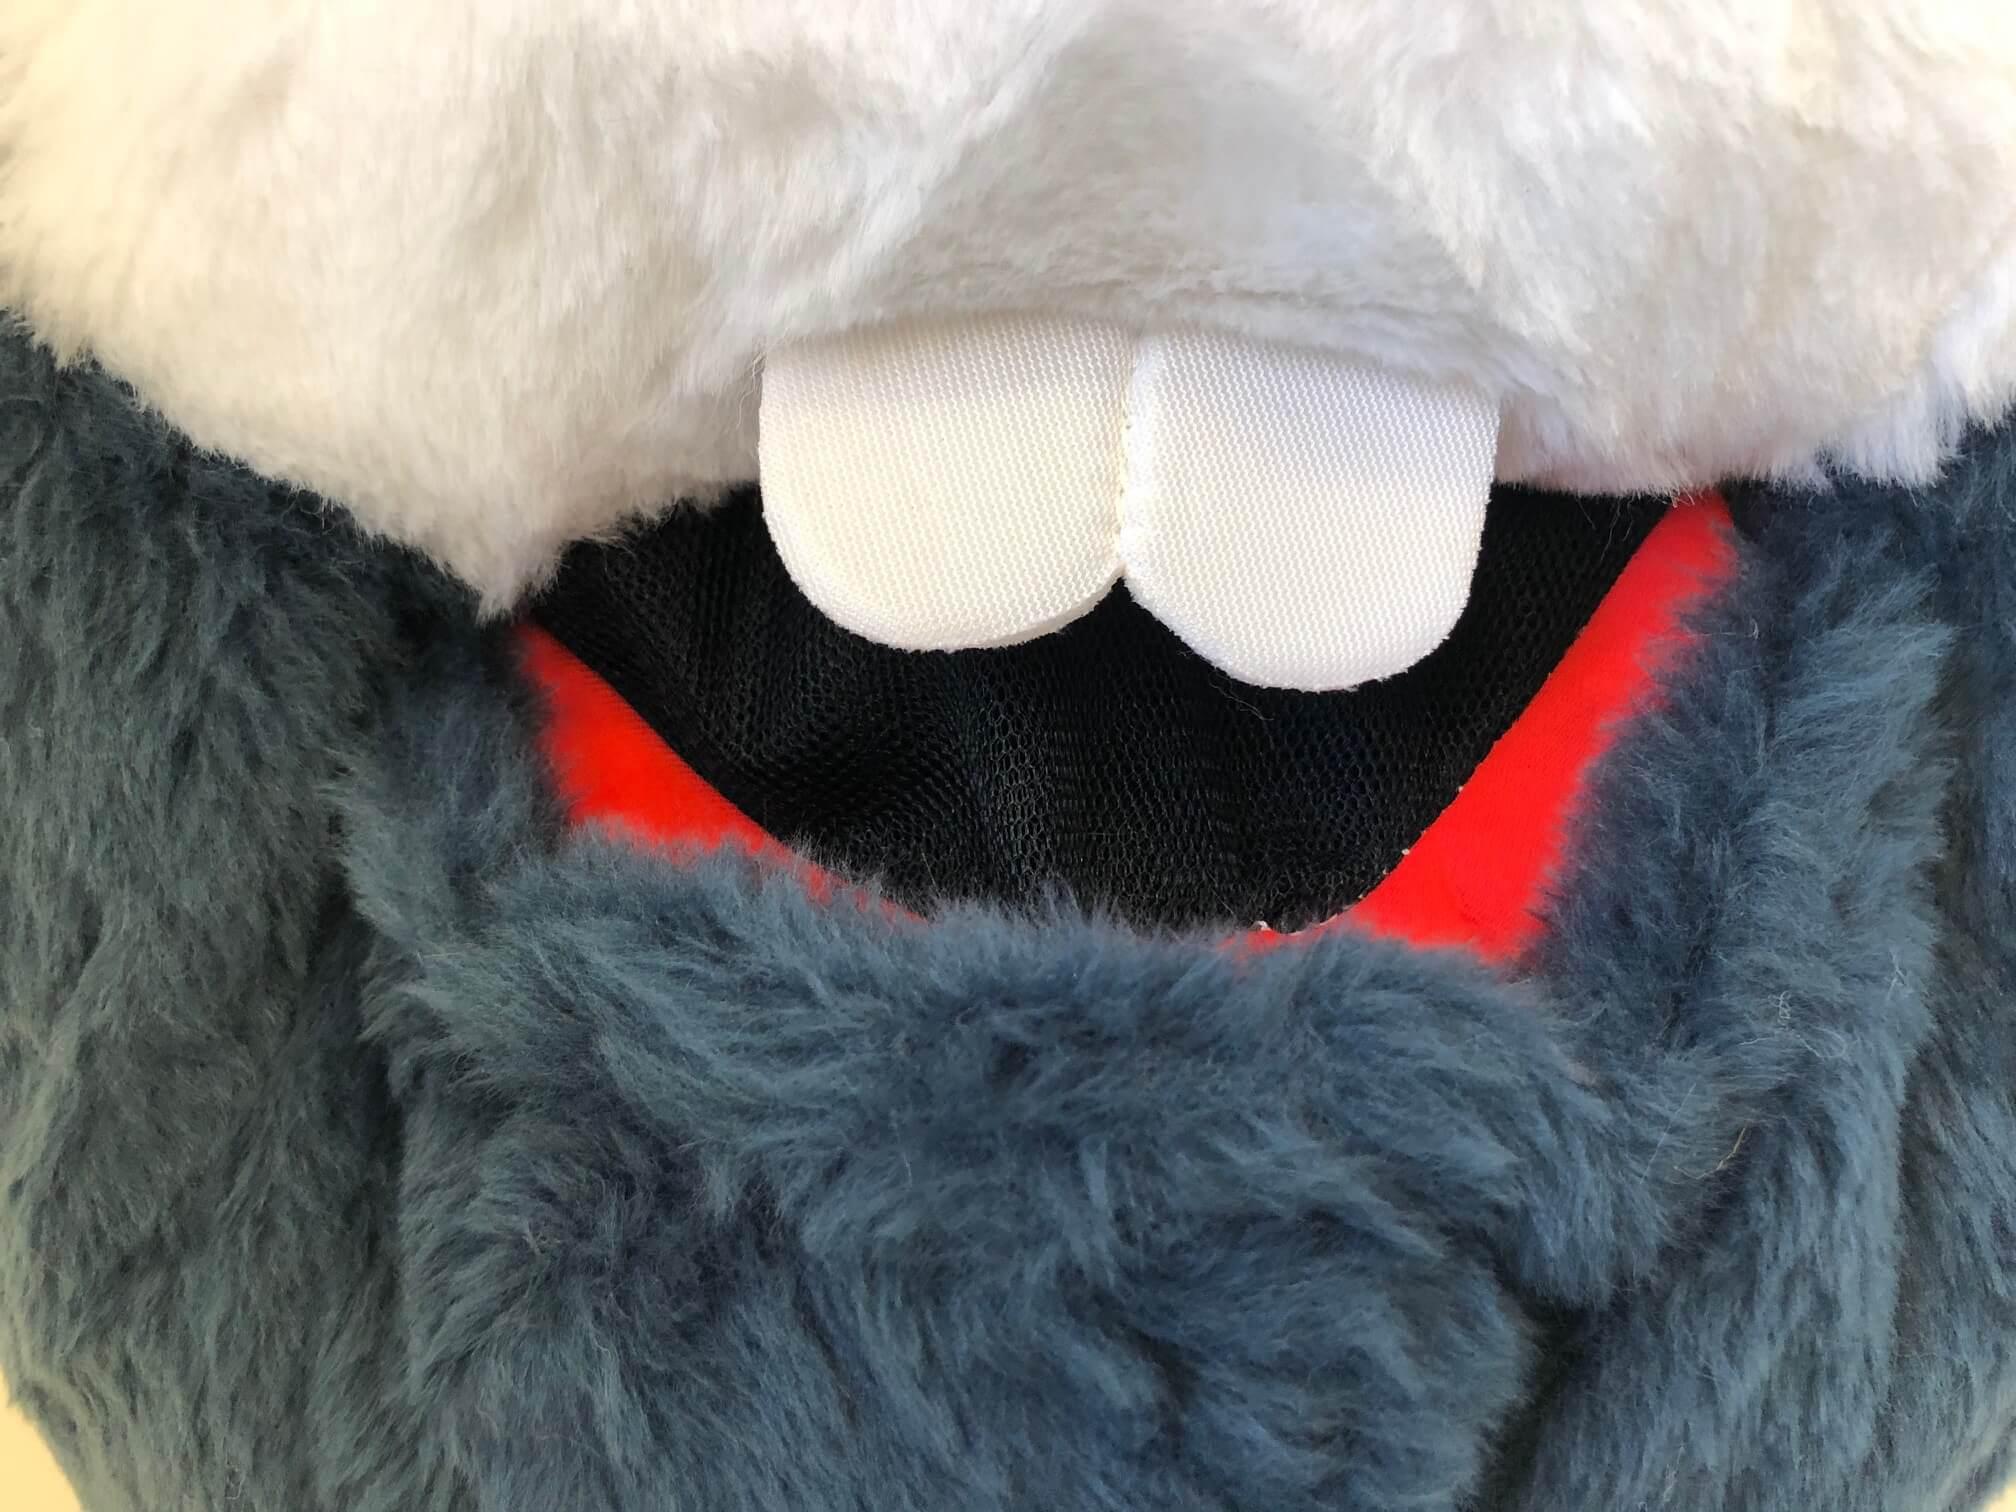 Maus-1p-Kostume-Lauffigur